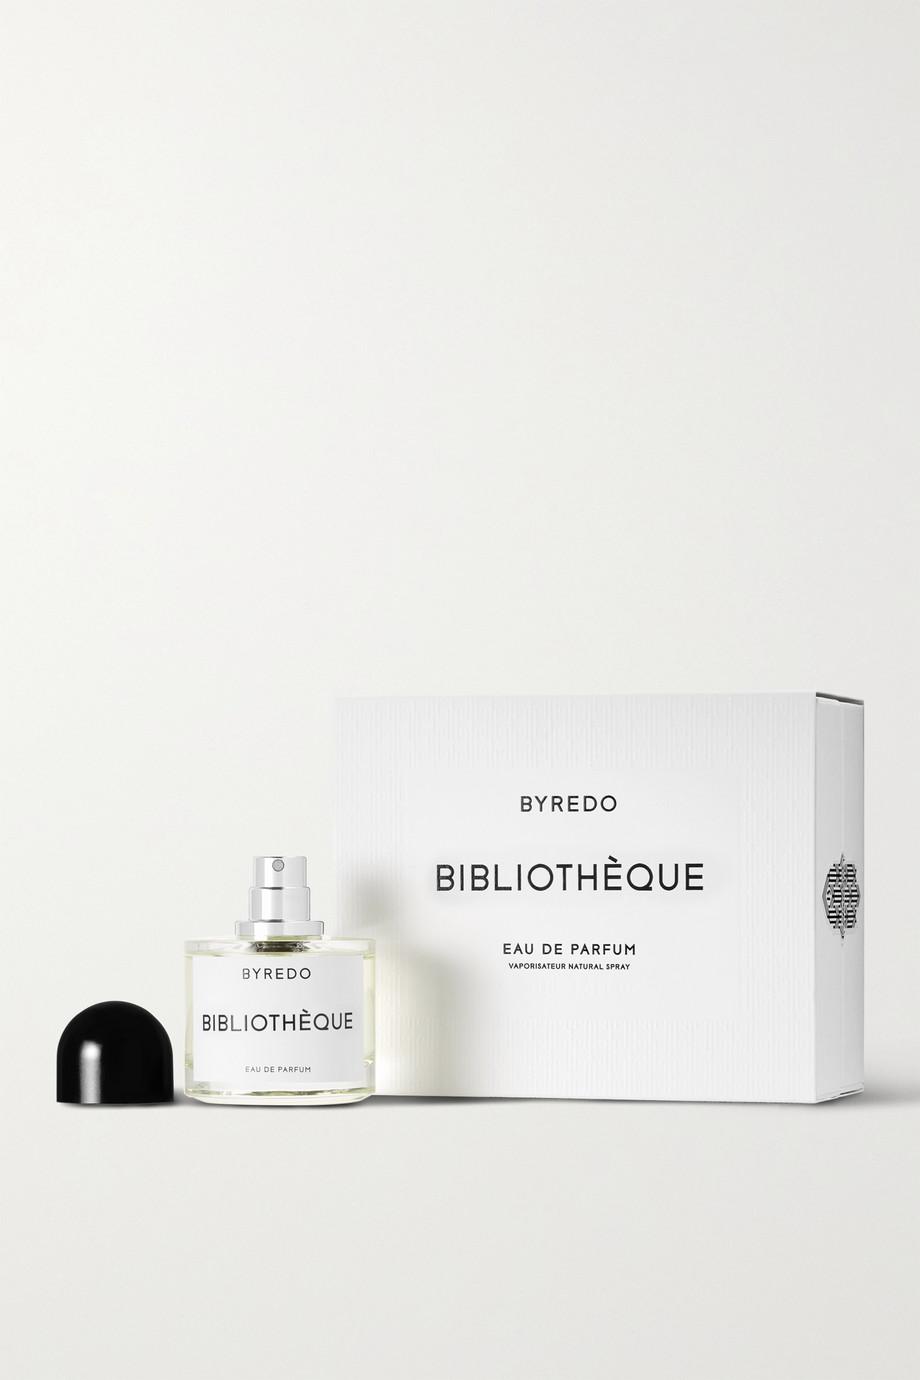 Byredo Eau de Parfum - Bibliothèque, 50ml